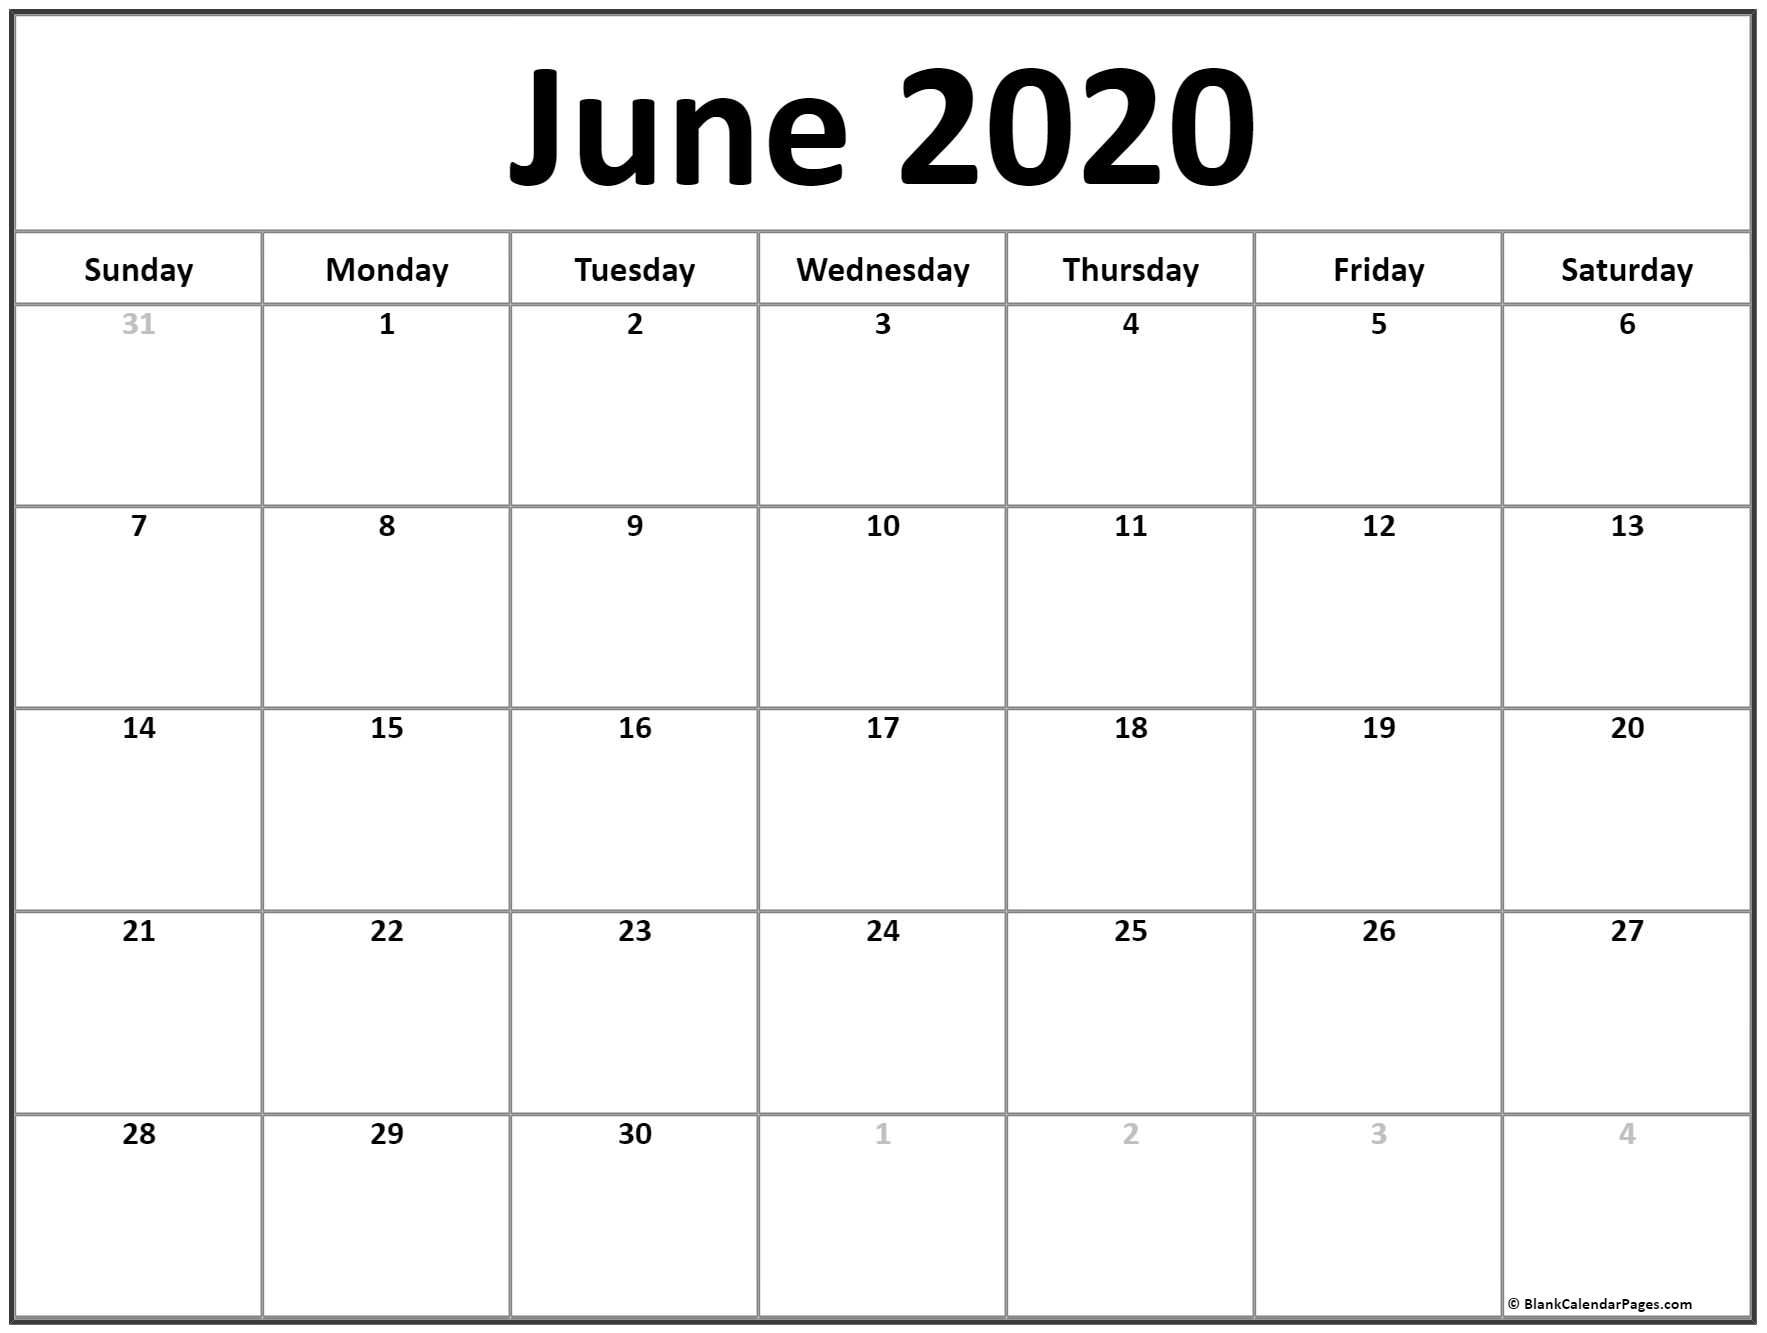 June 2020 Calendar | Free Printable Monthly Calendars inside 2020 Calendar With Space To Write